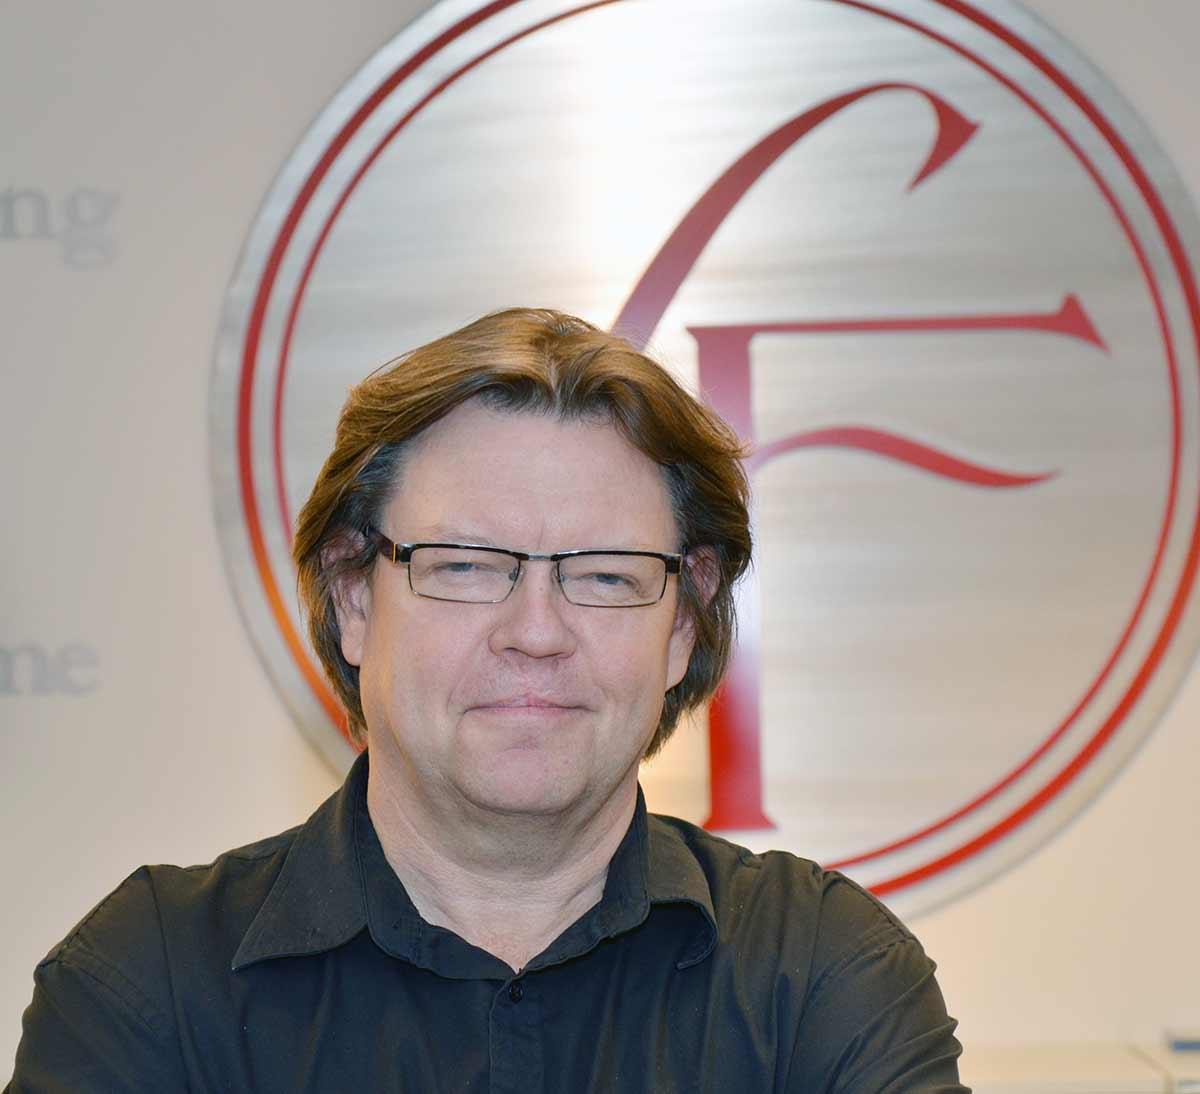 Åge Hoffart, leder for kinoavdelingen hos SF Norge AS. Foto: John Berge, KINOMAGASINET ©